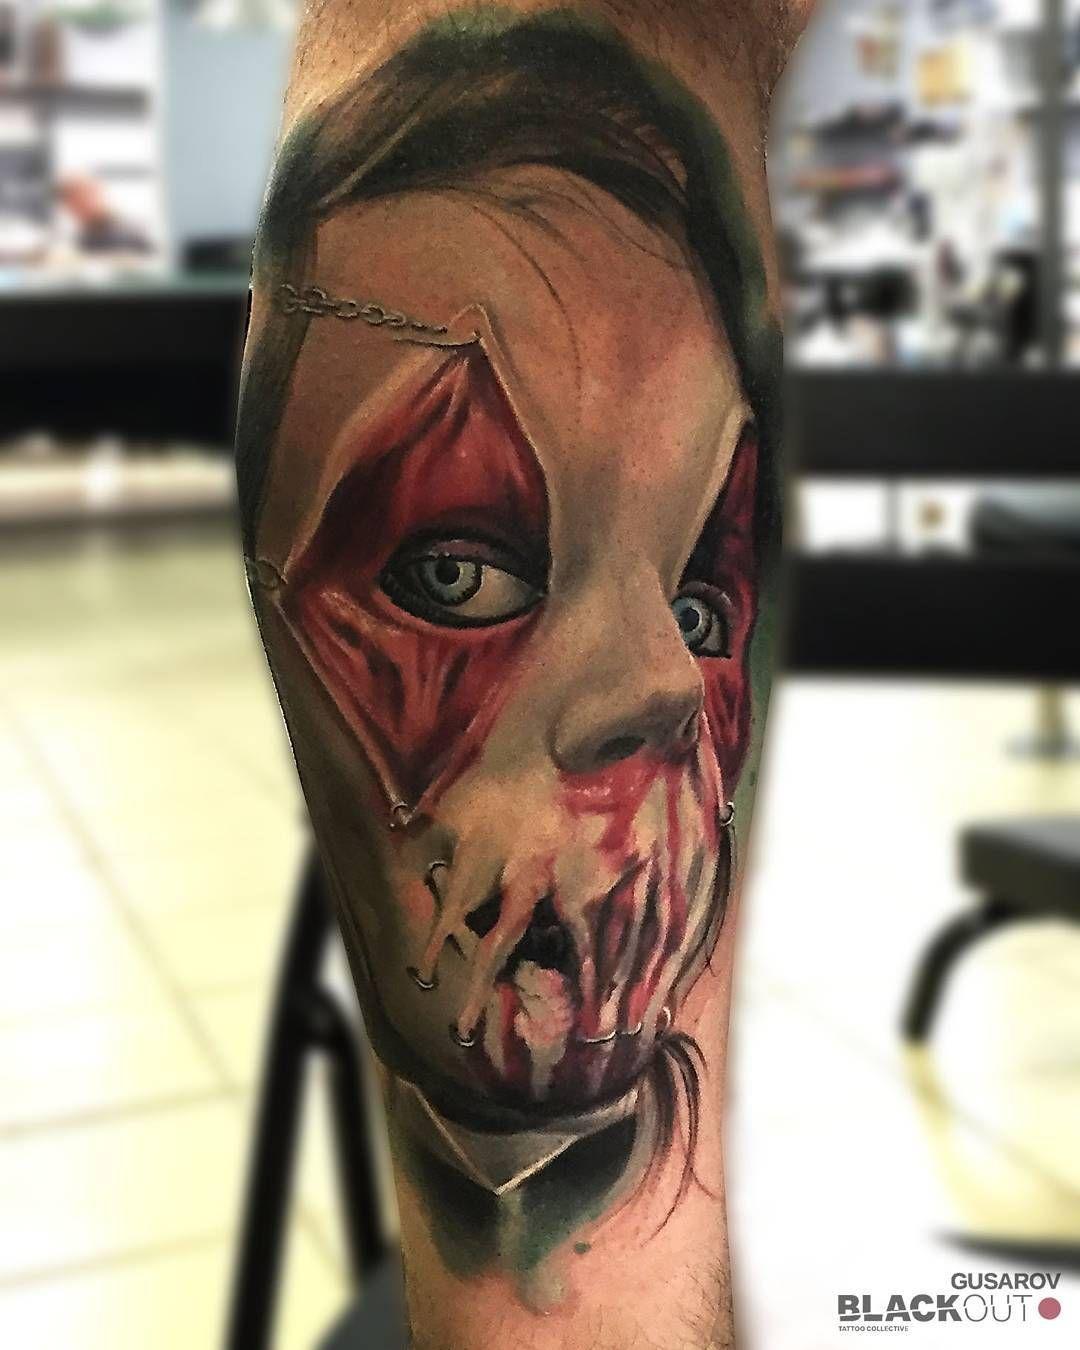 Pavlik Gusarov @_gusarov BLACKOUT tattoo collective @blackouttattoocollective…